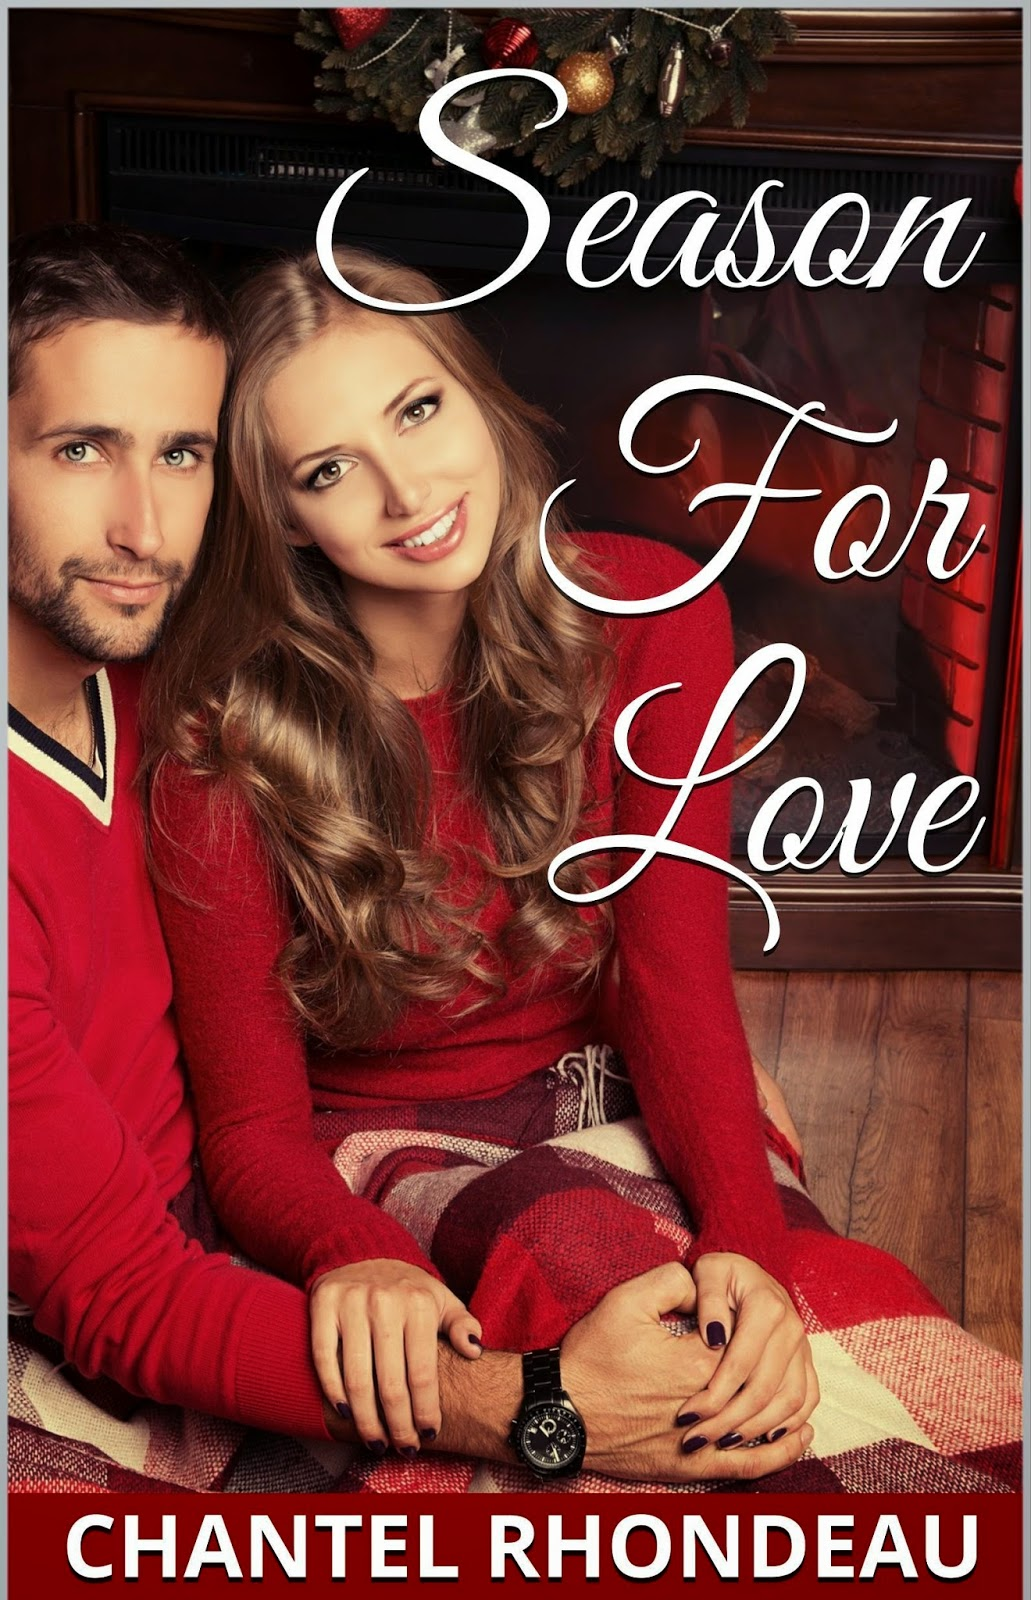 Mia Hoddell: 12 Days of Christmas ~ Meet Chantel Rhondeau